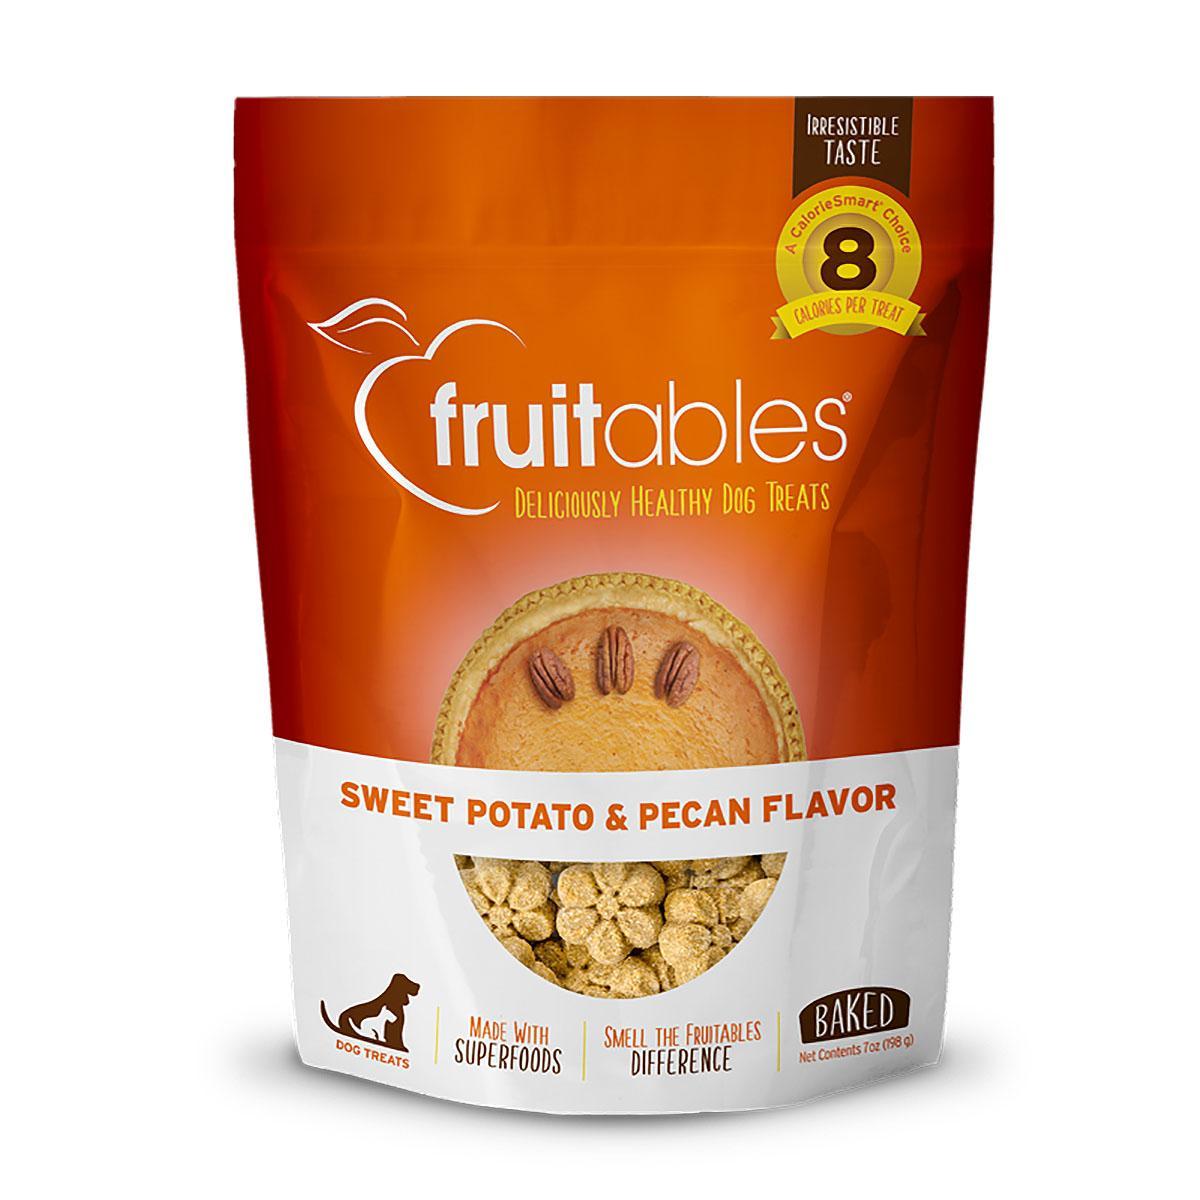 Fruitables Dog Treats - Sweet Potato & Pecan